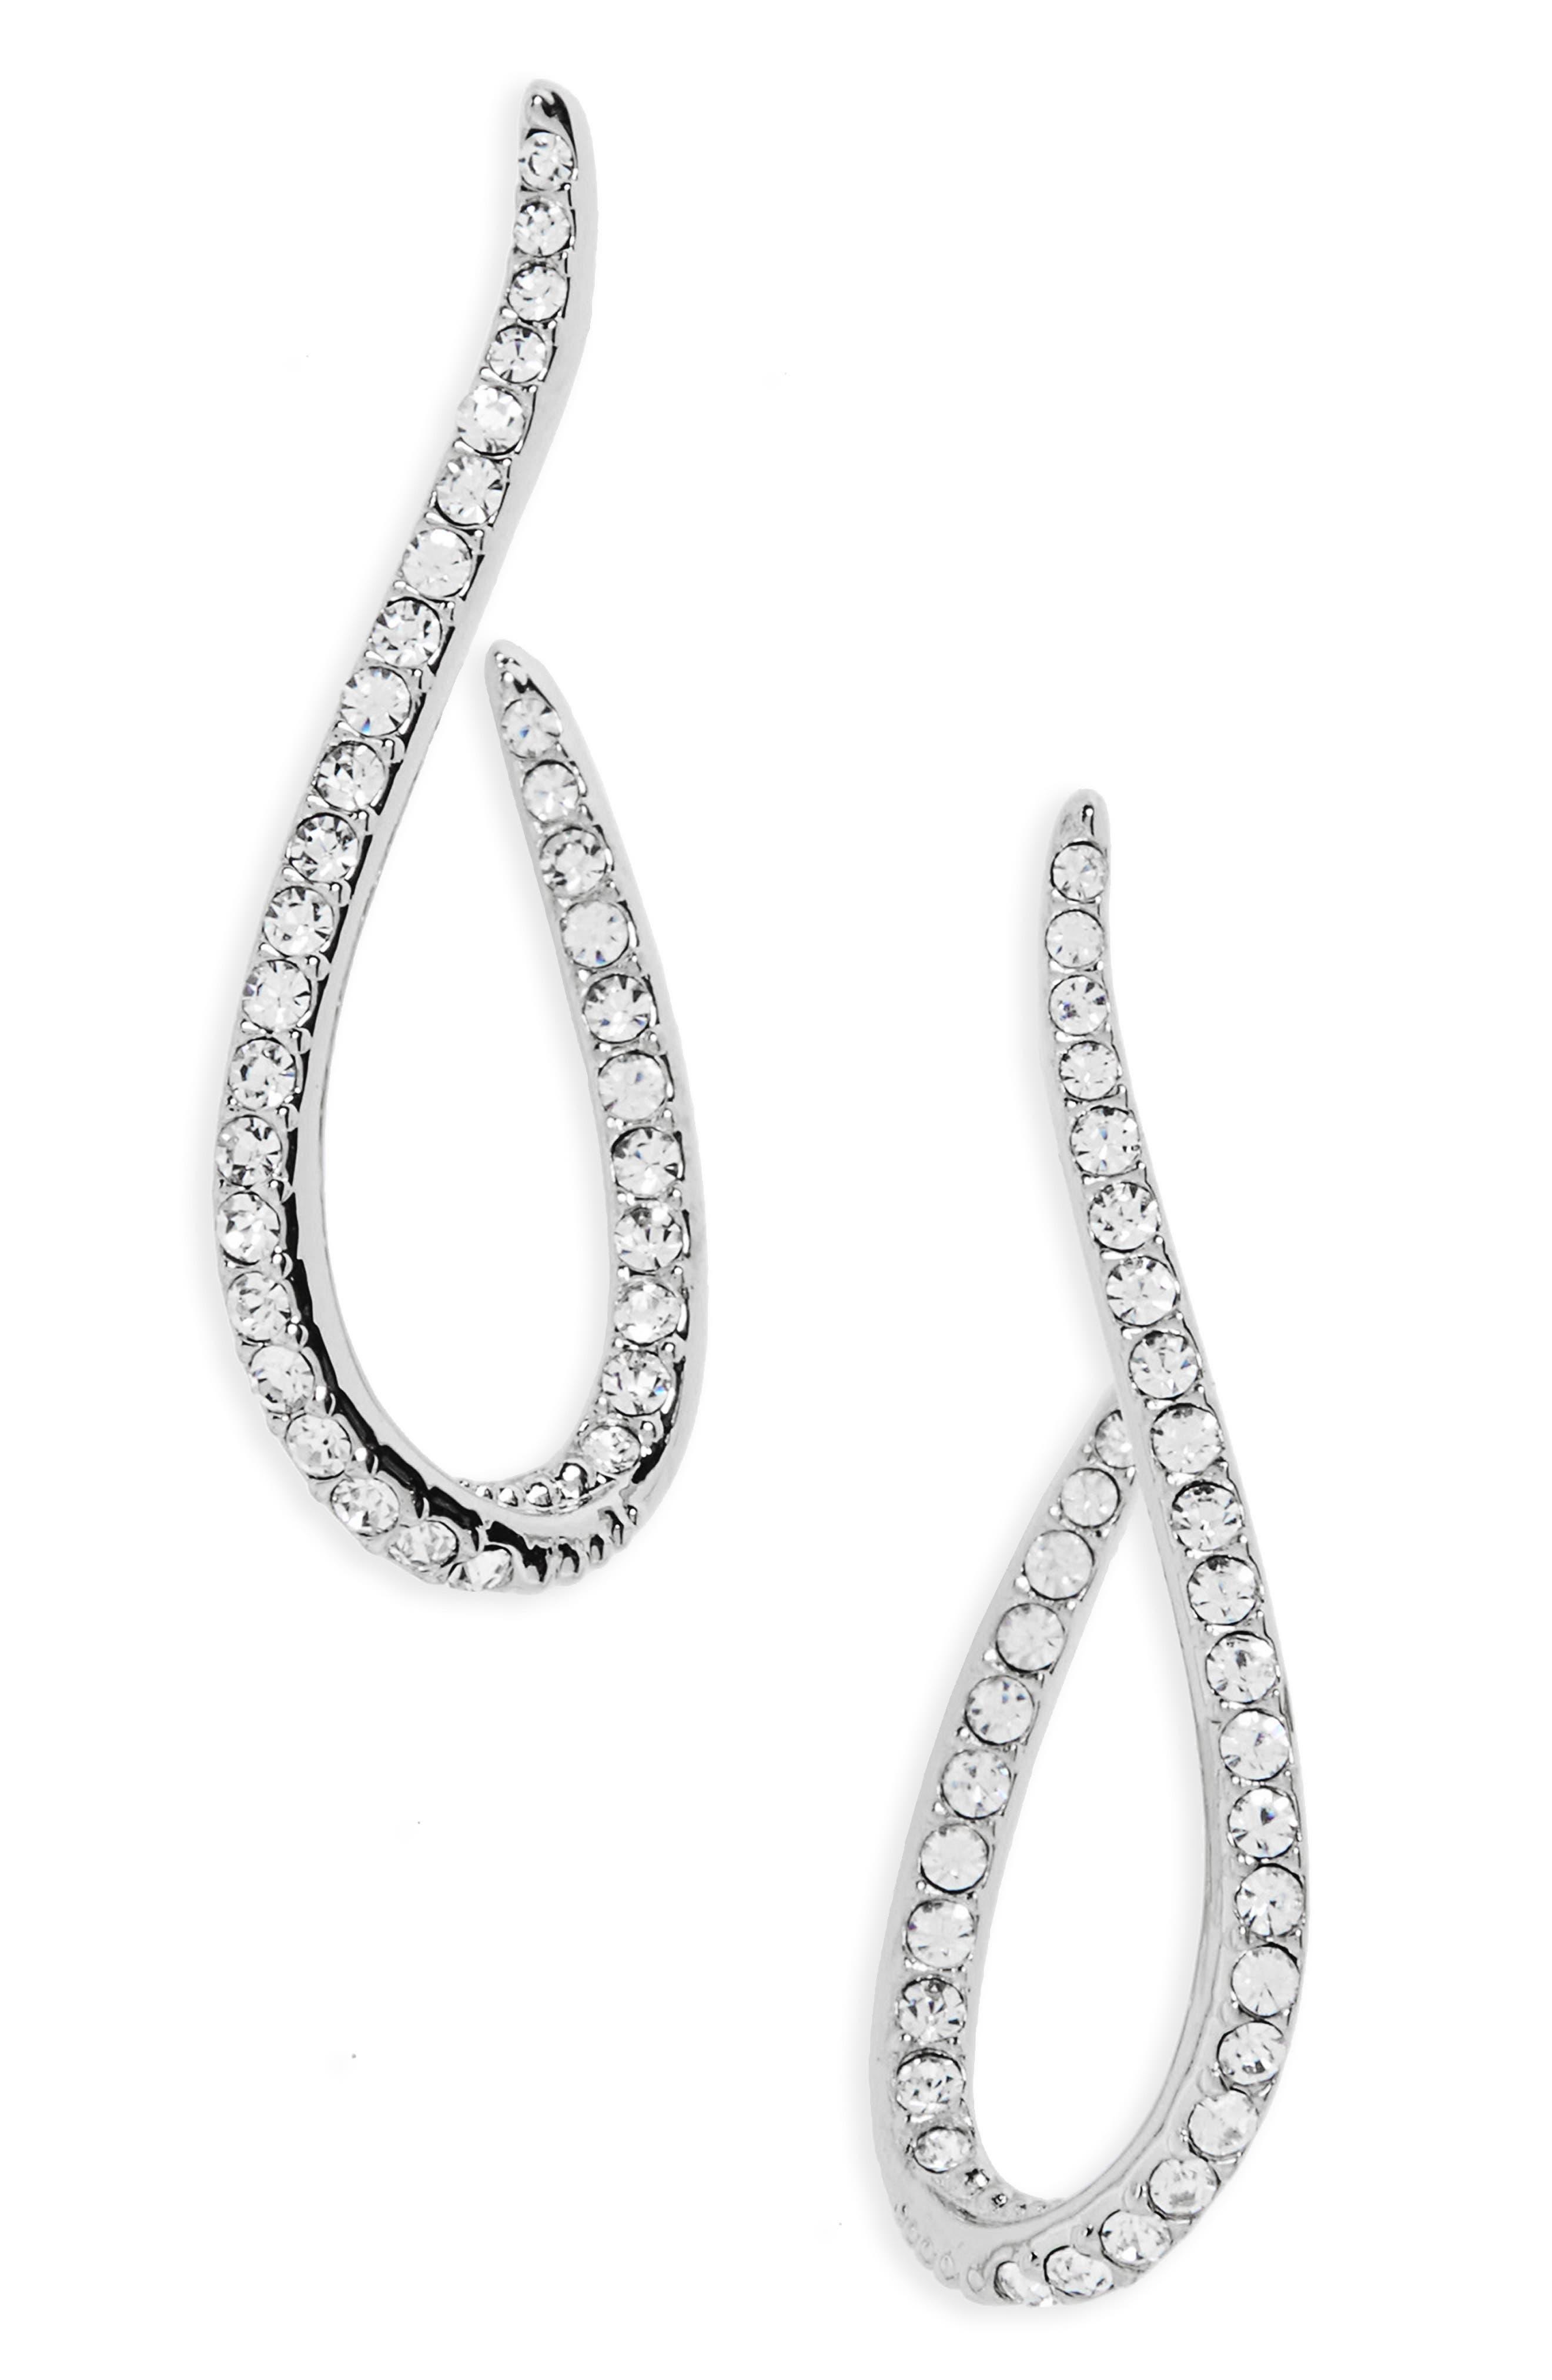 Citron J Hoop Crystal Drop Earrings,                             Main thumbnail 1, color,                             040